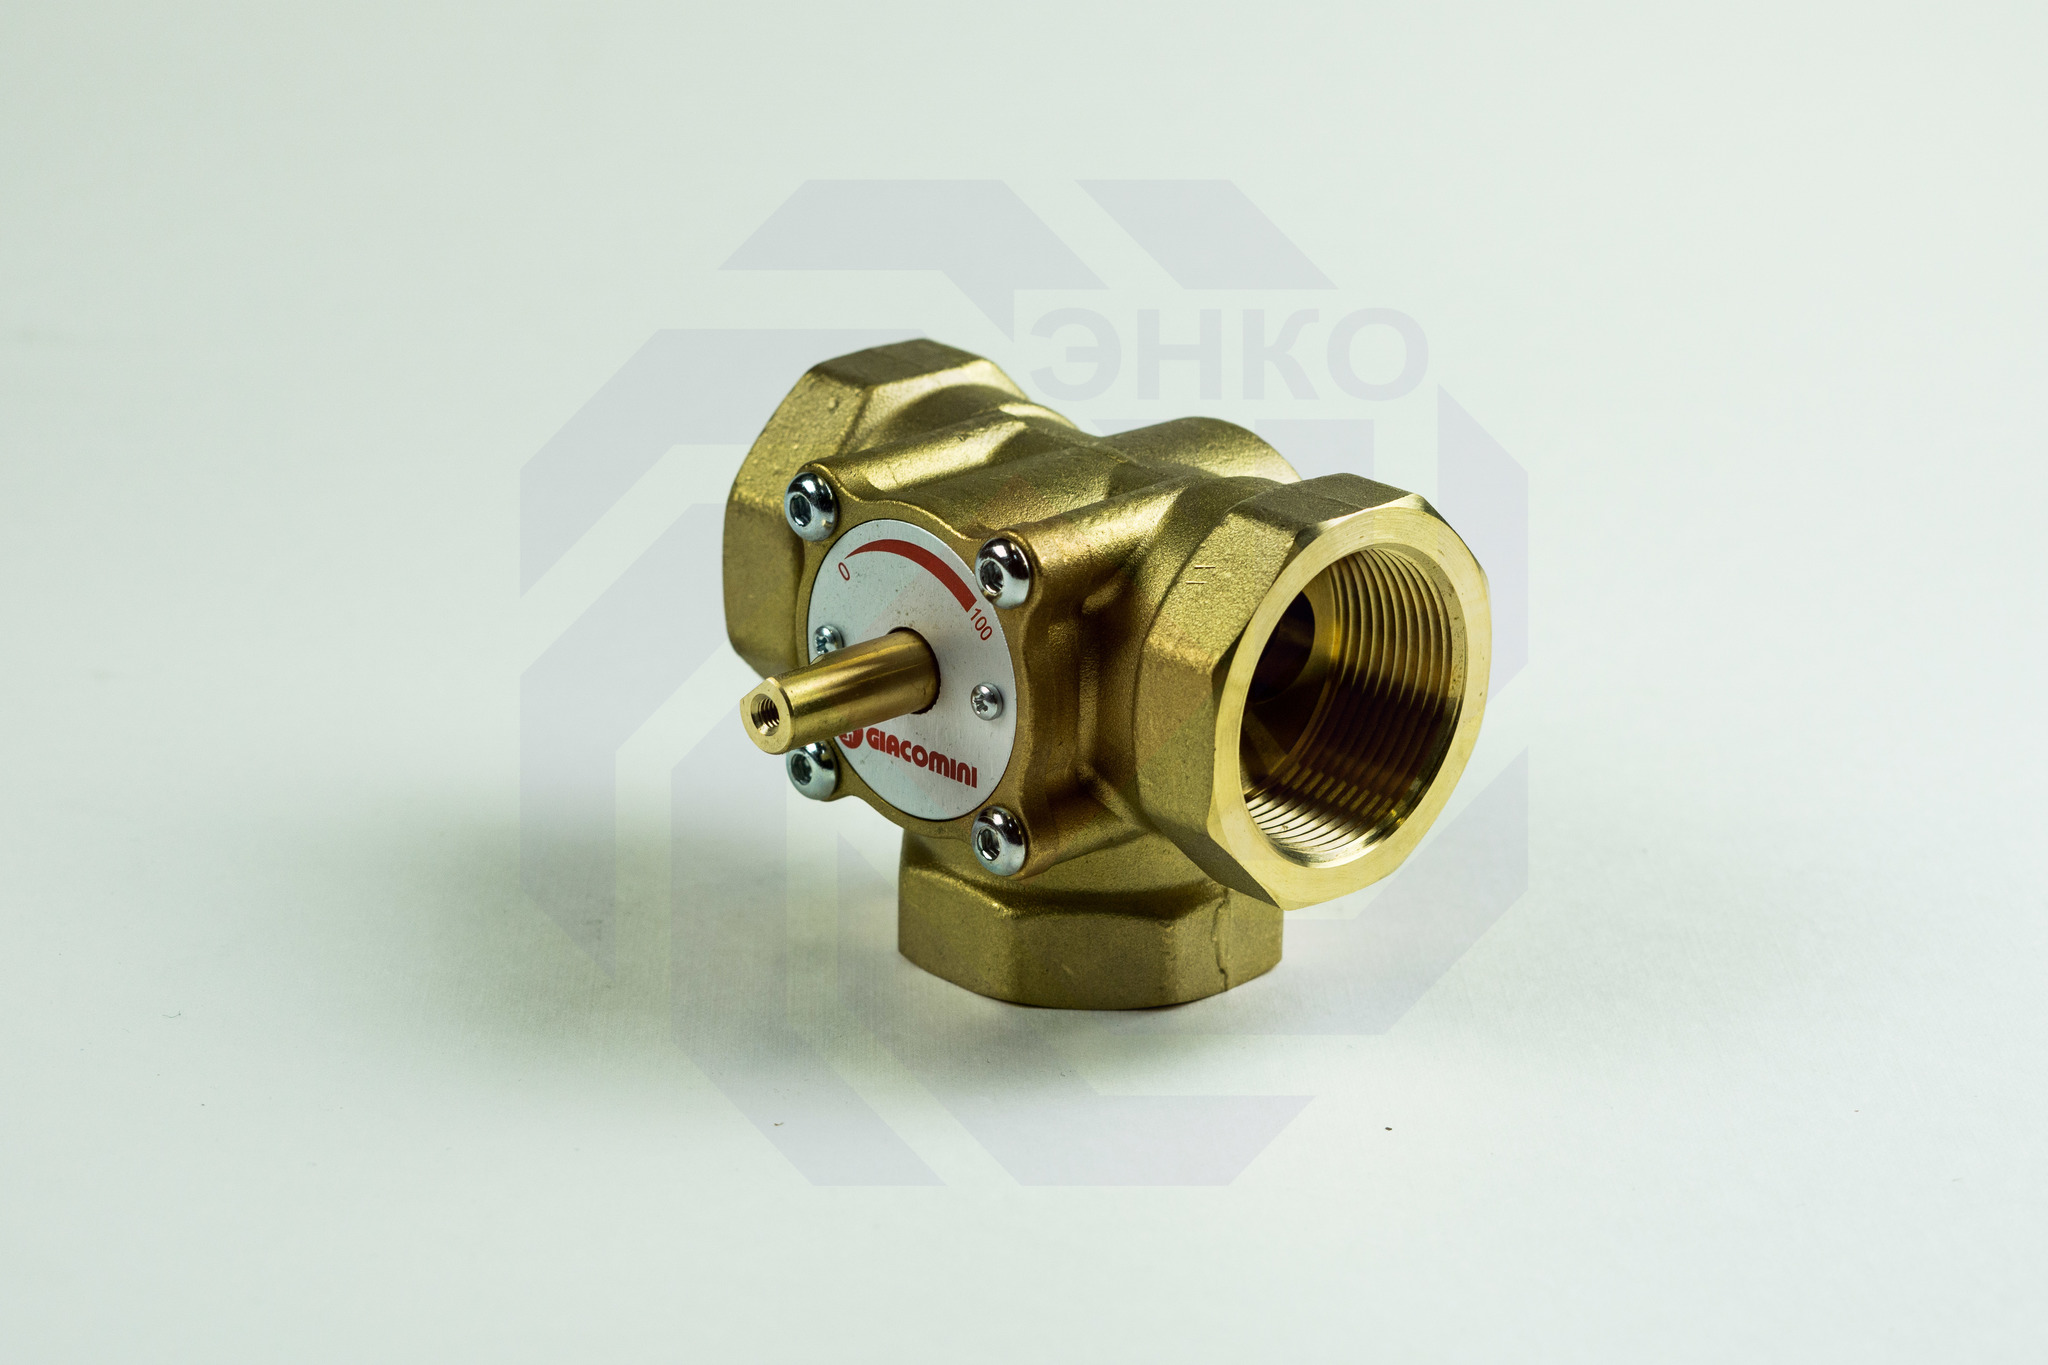 Клапан поворотный трехходовой GIACOMINI R297 1½